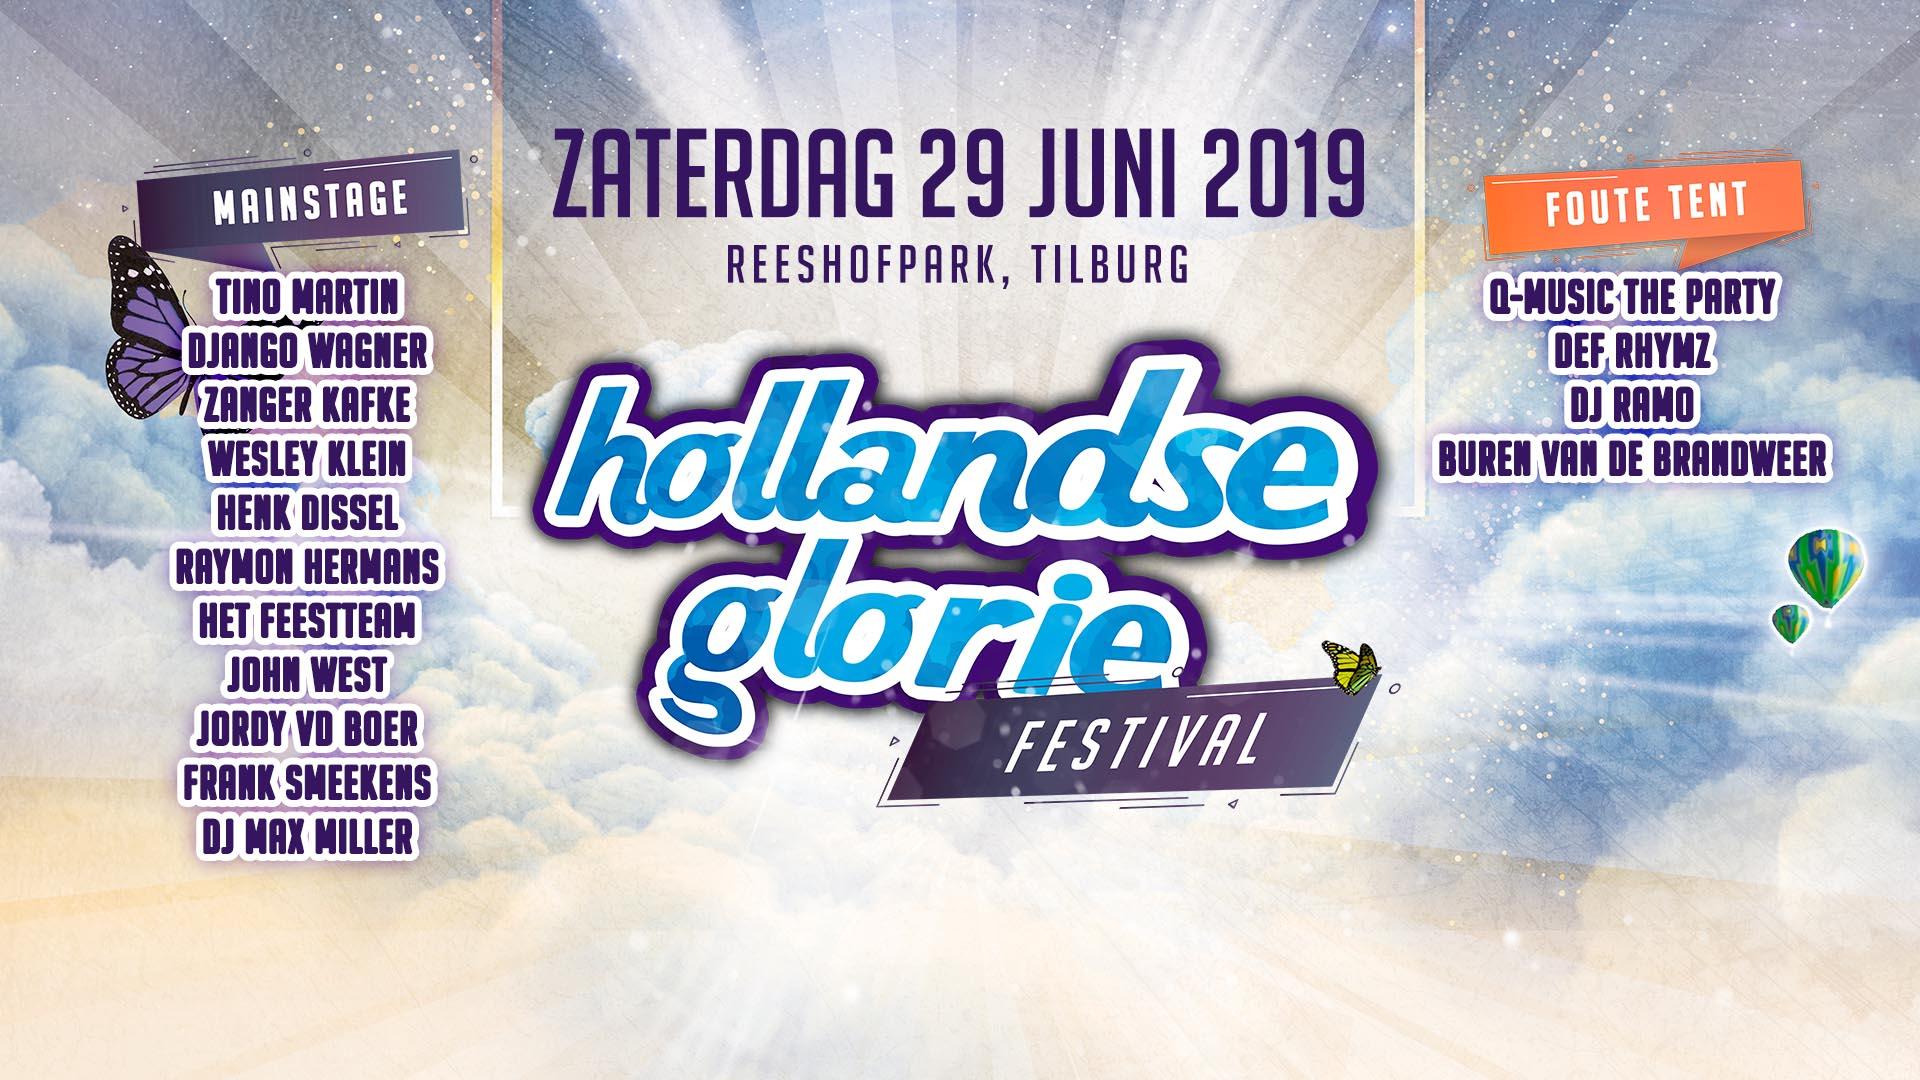 2019-hg-festival-header-1920x1080